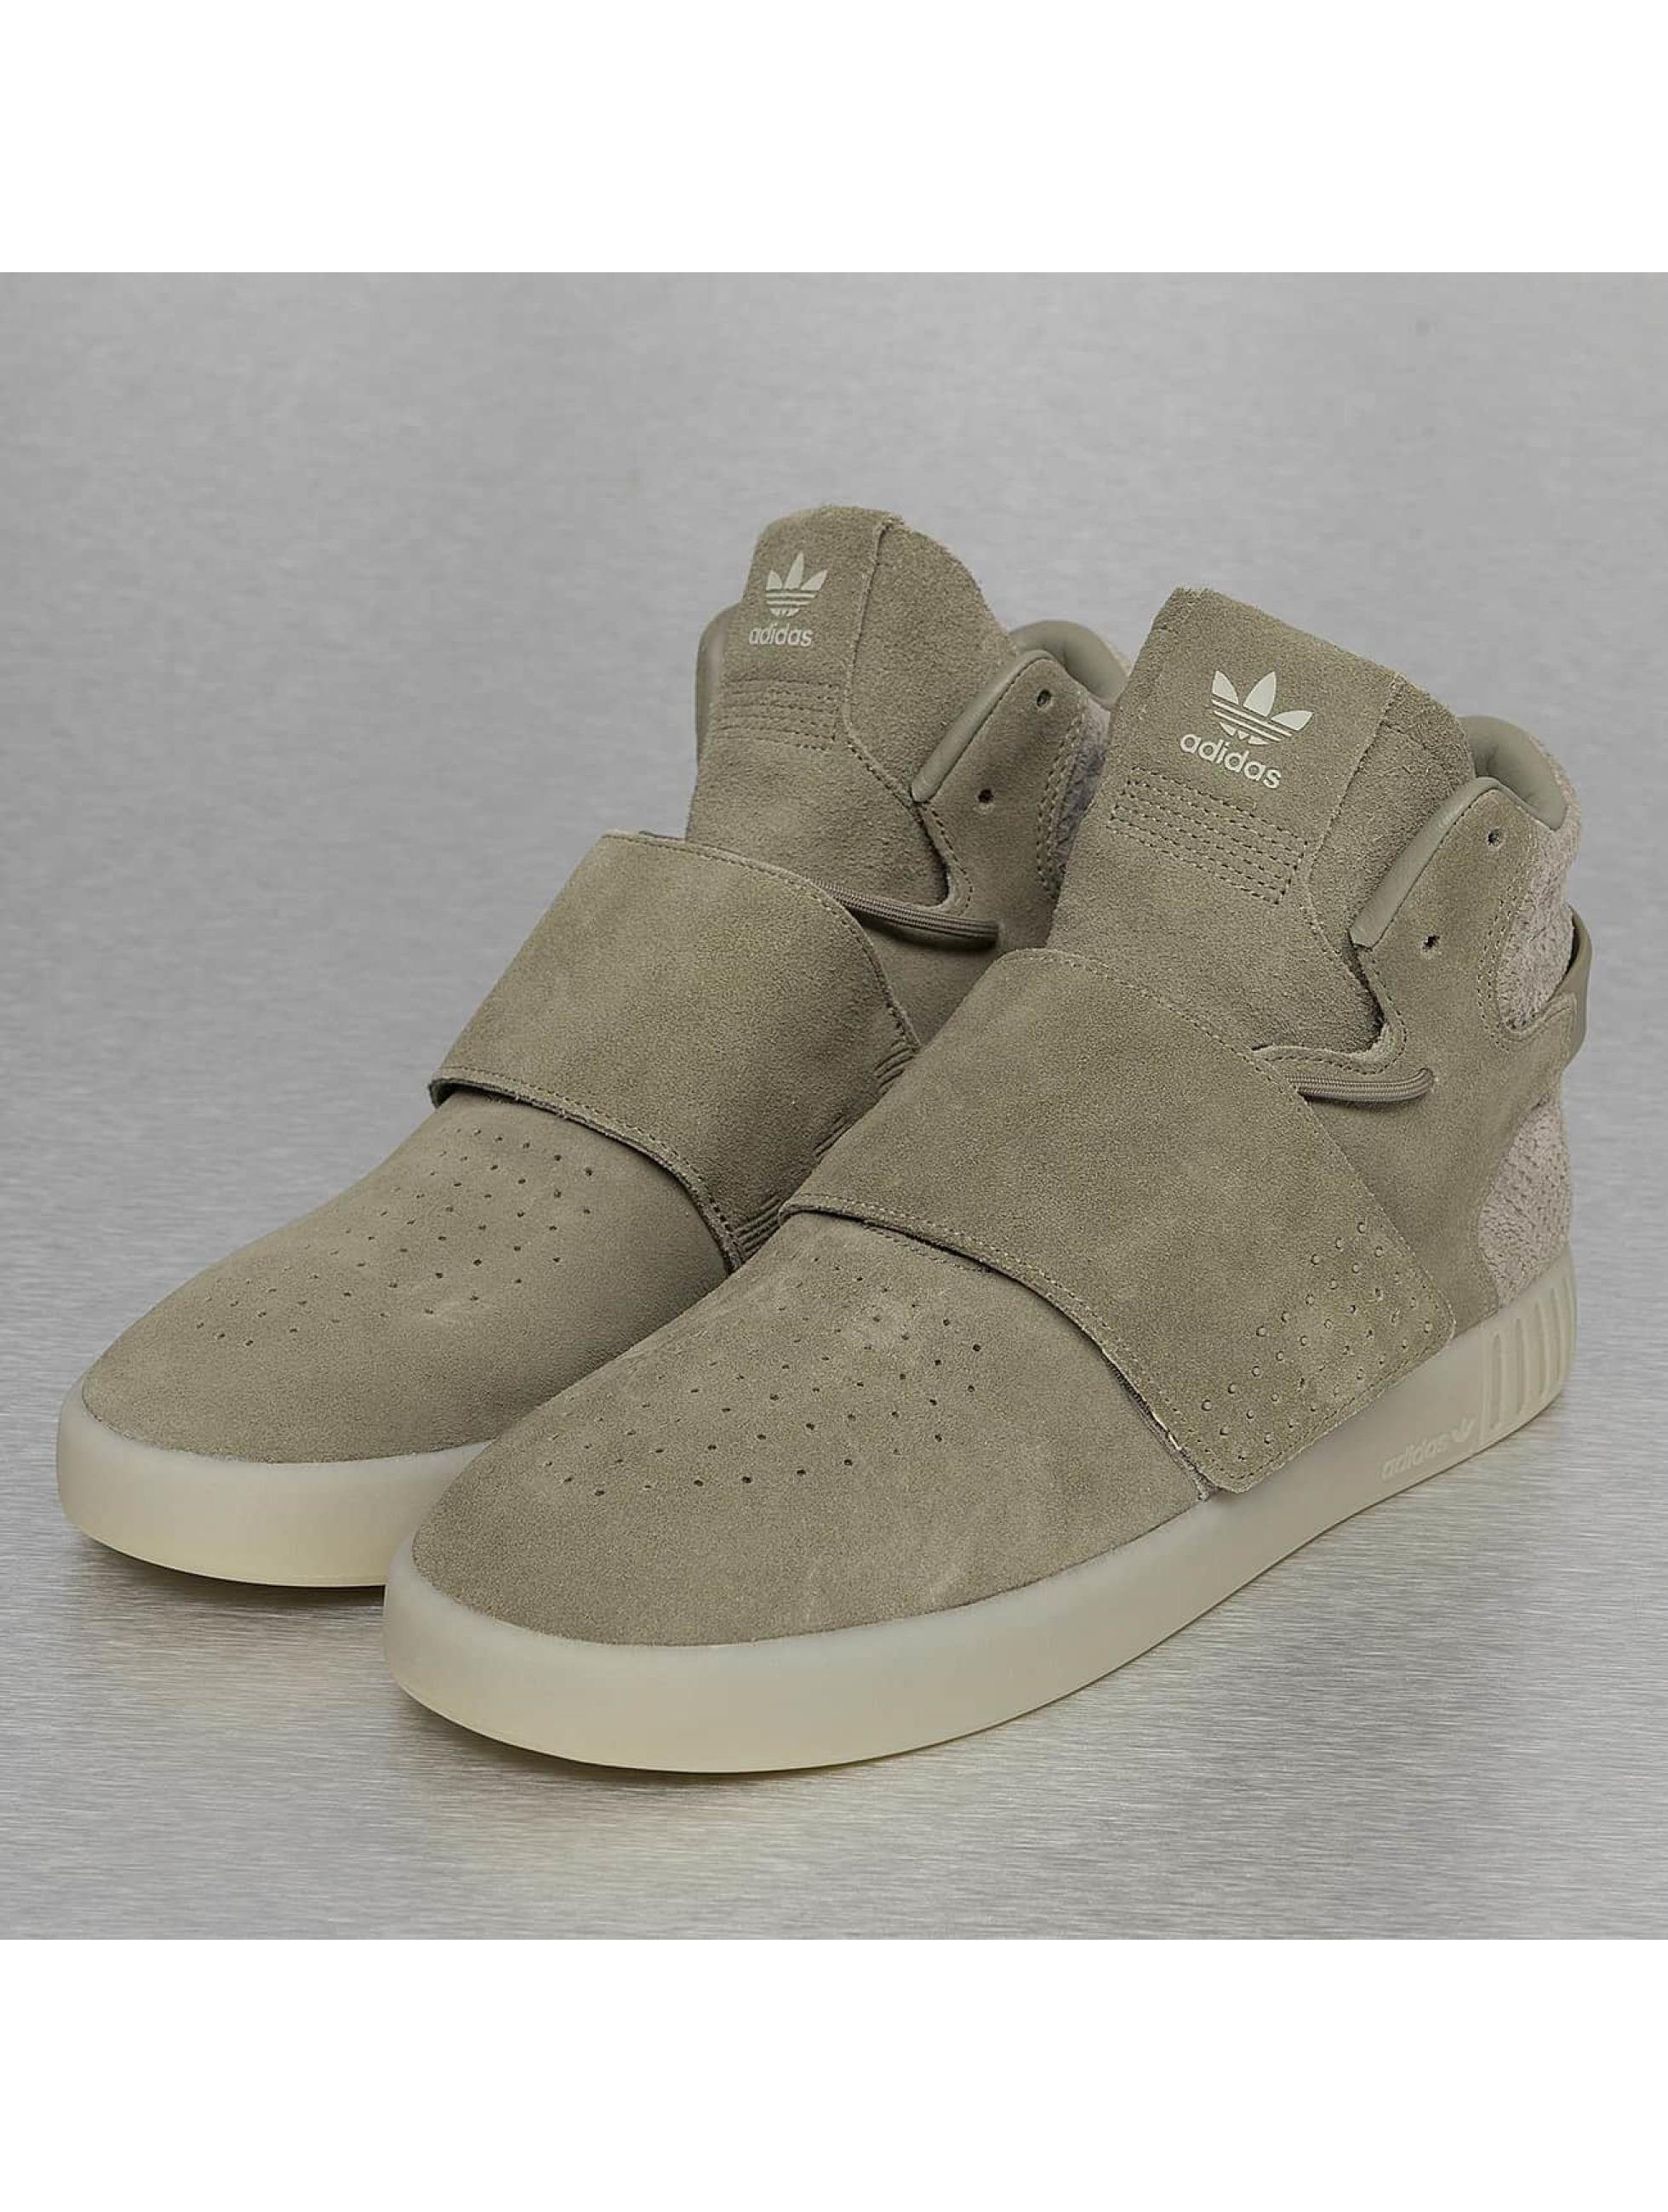 adidas schoen / sneaker Tubular Invader Strap in olijfgroen